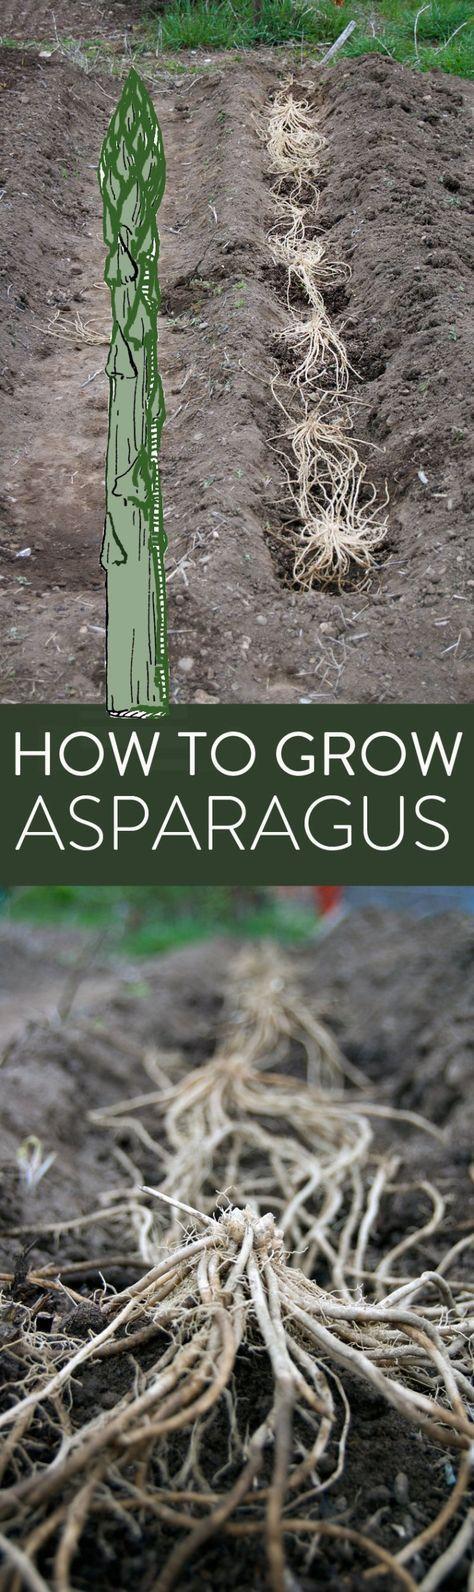 how-to-grow-asparagus-longpin